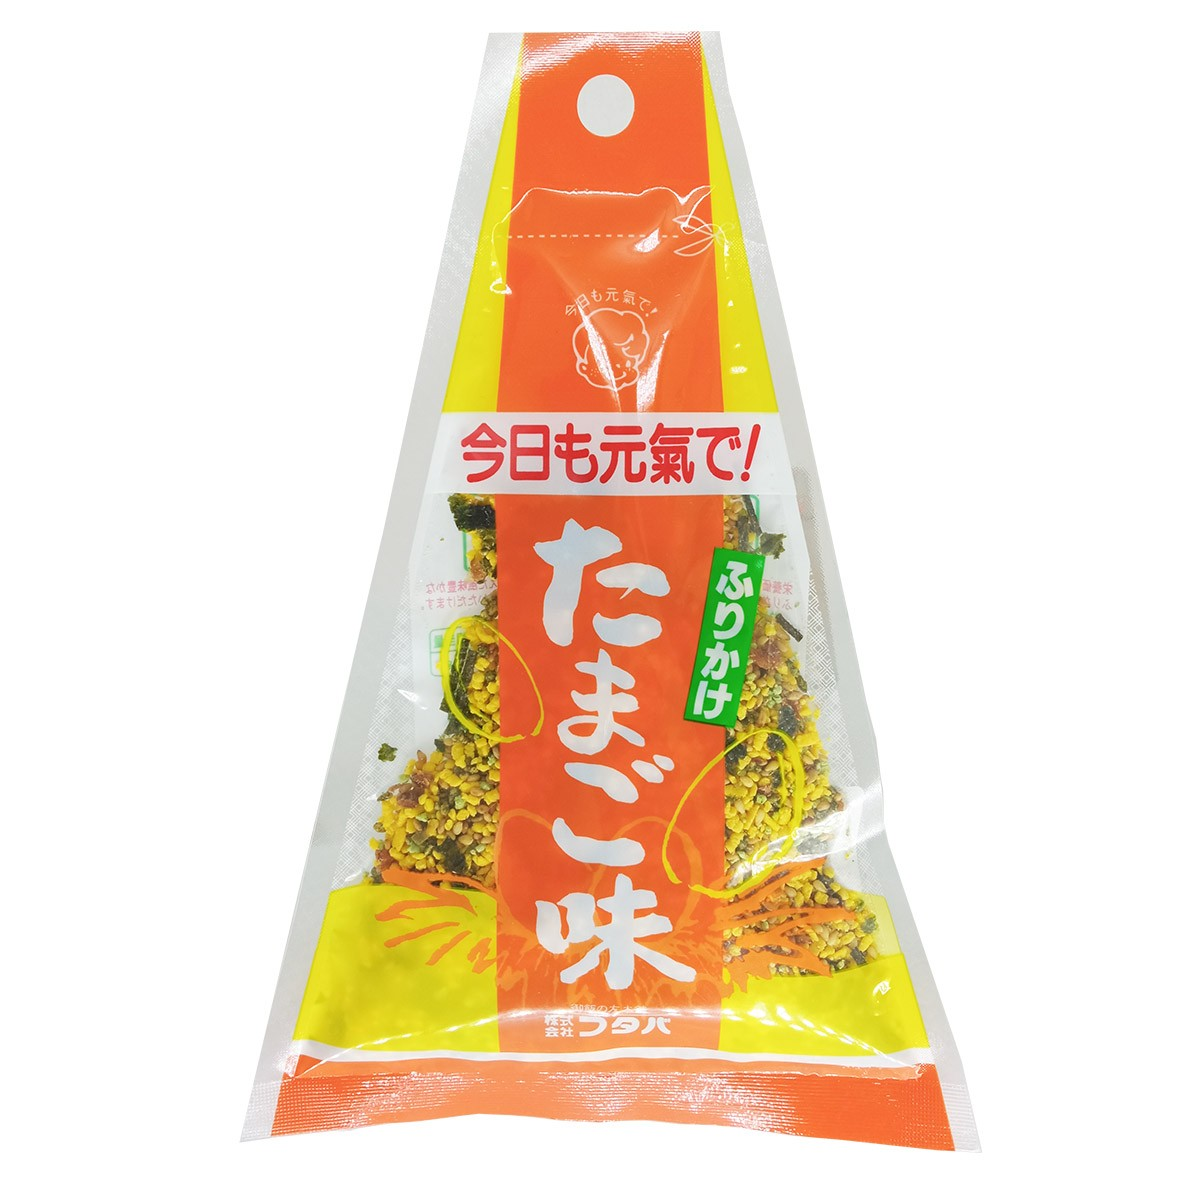 Furikake de Ovos Tamago 42g - Futaba